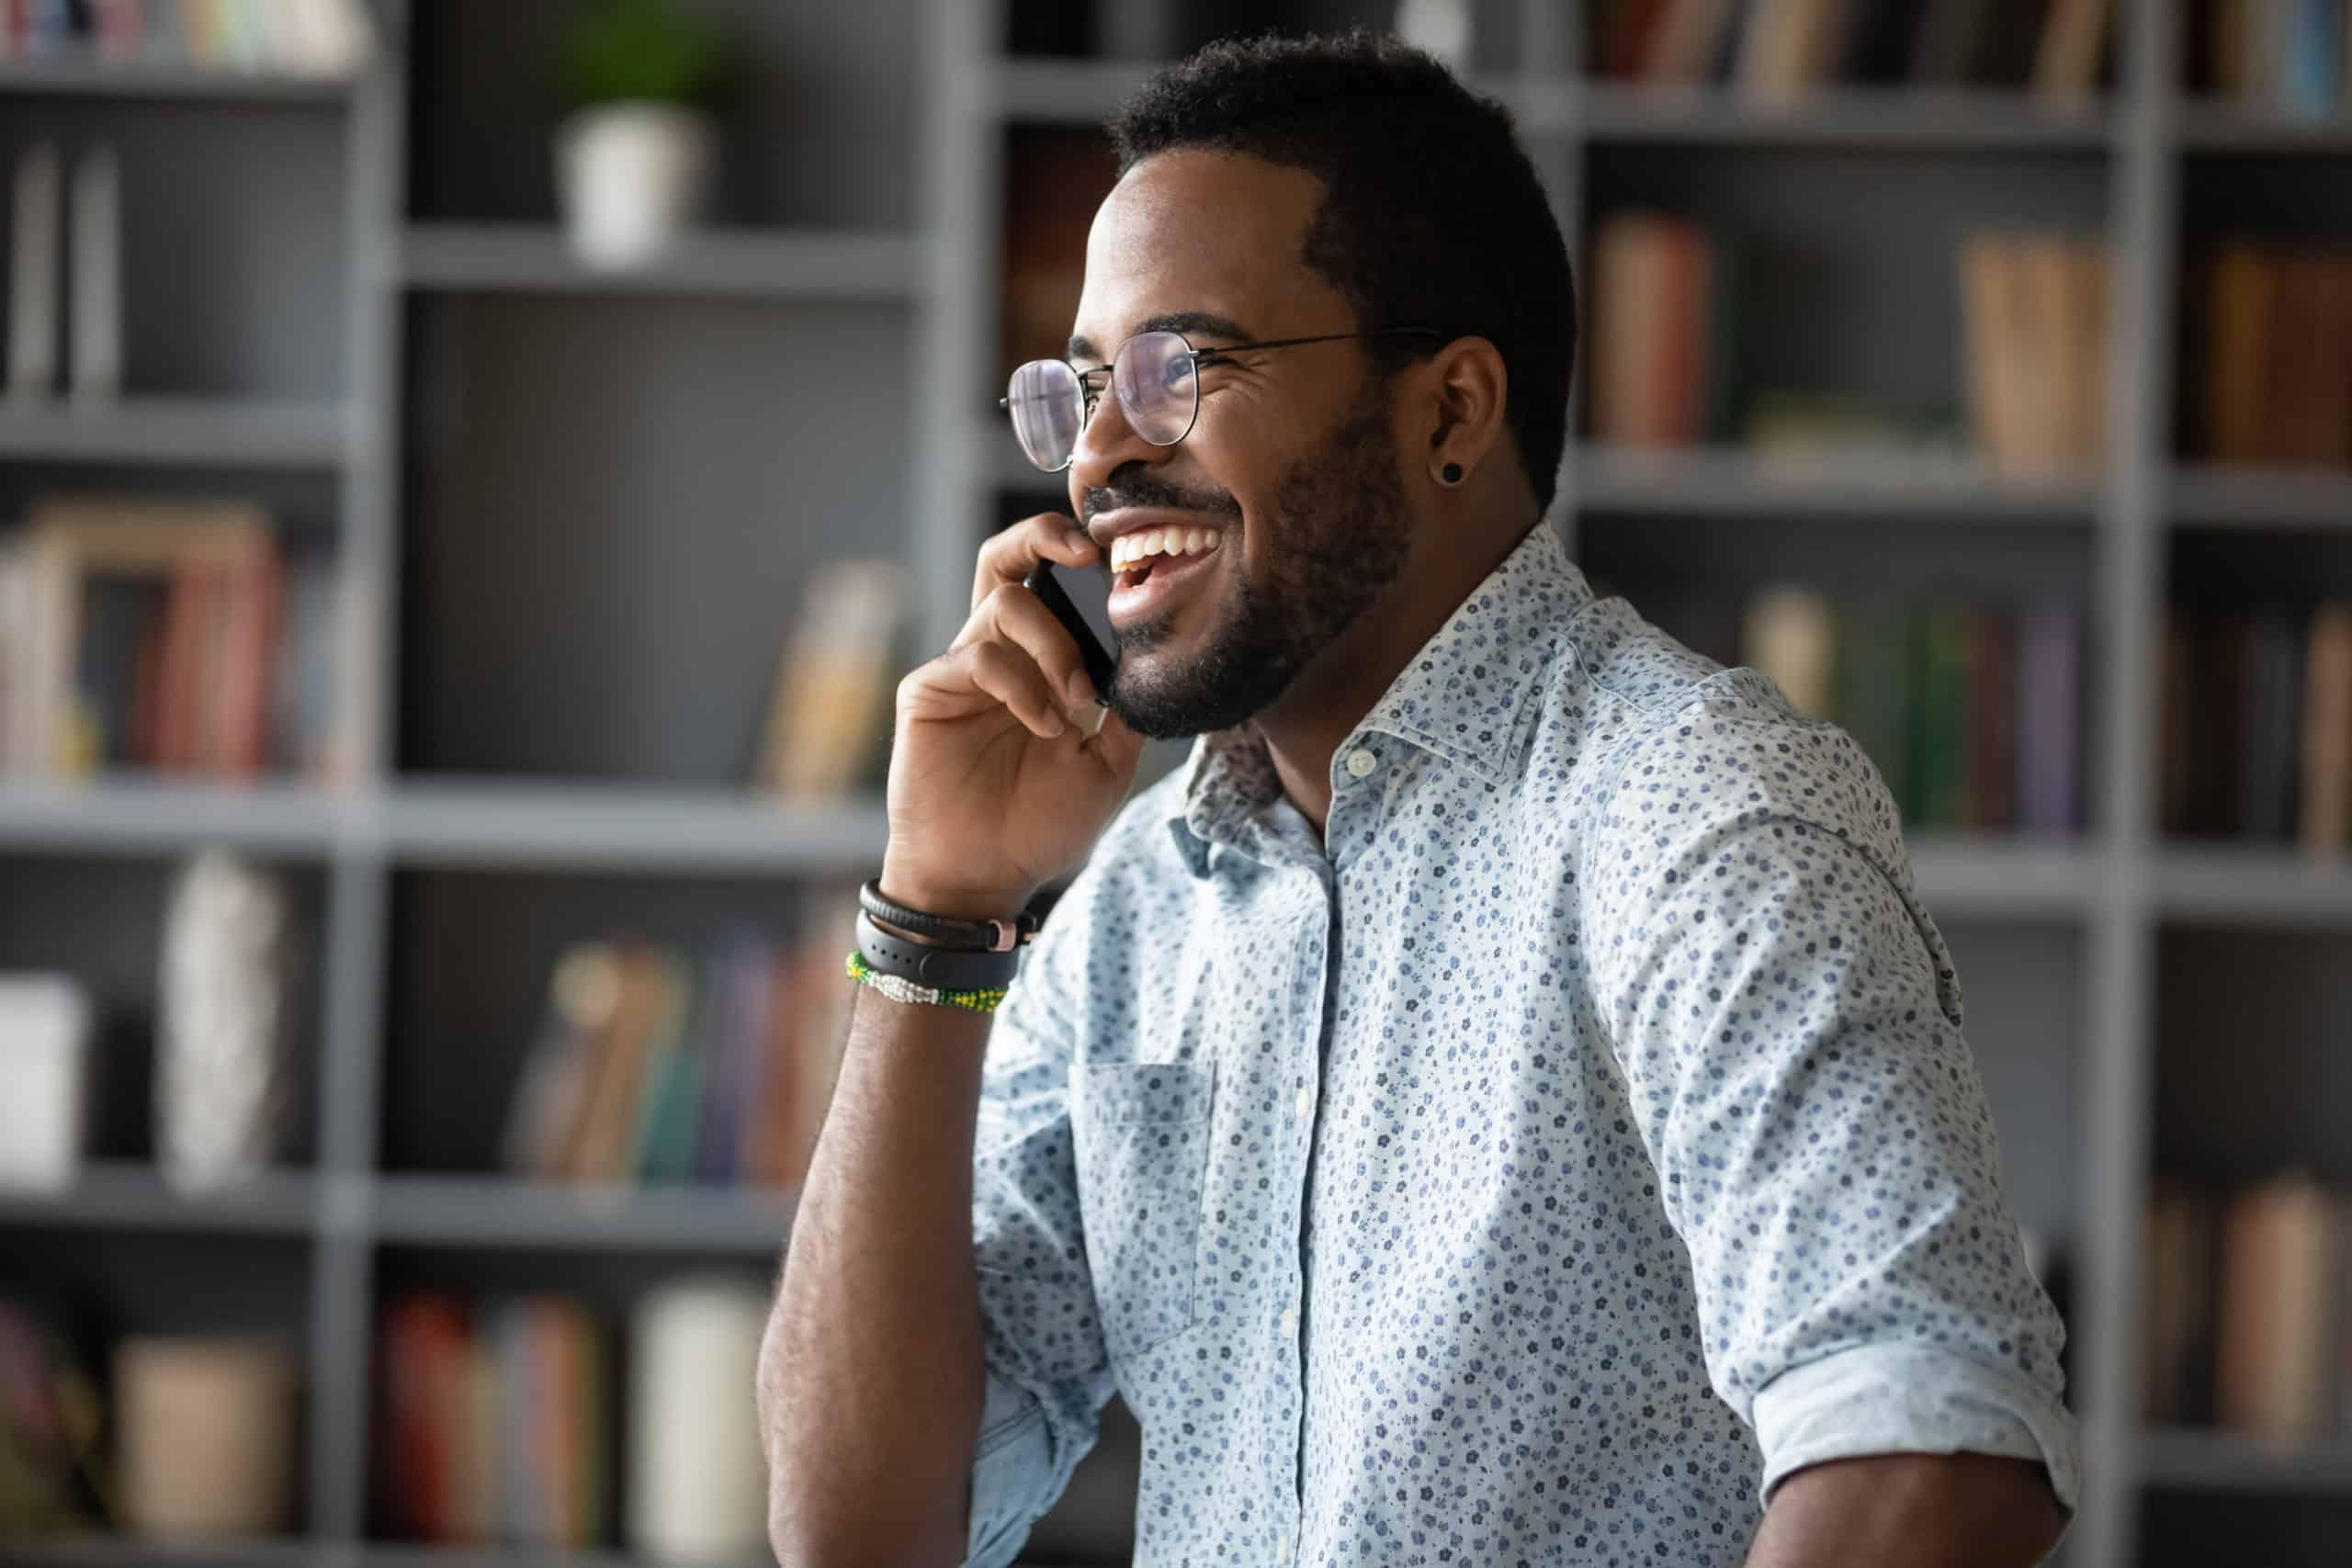 African businessman holding mobile phone enjoy informal conversation